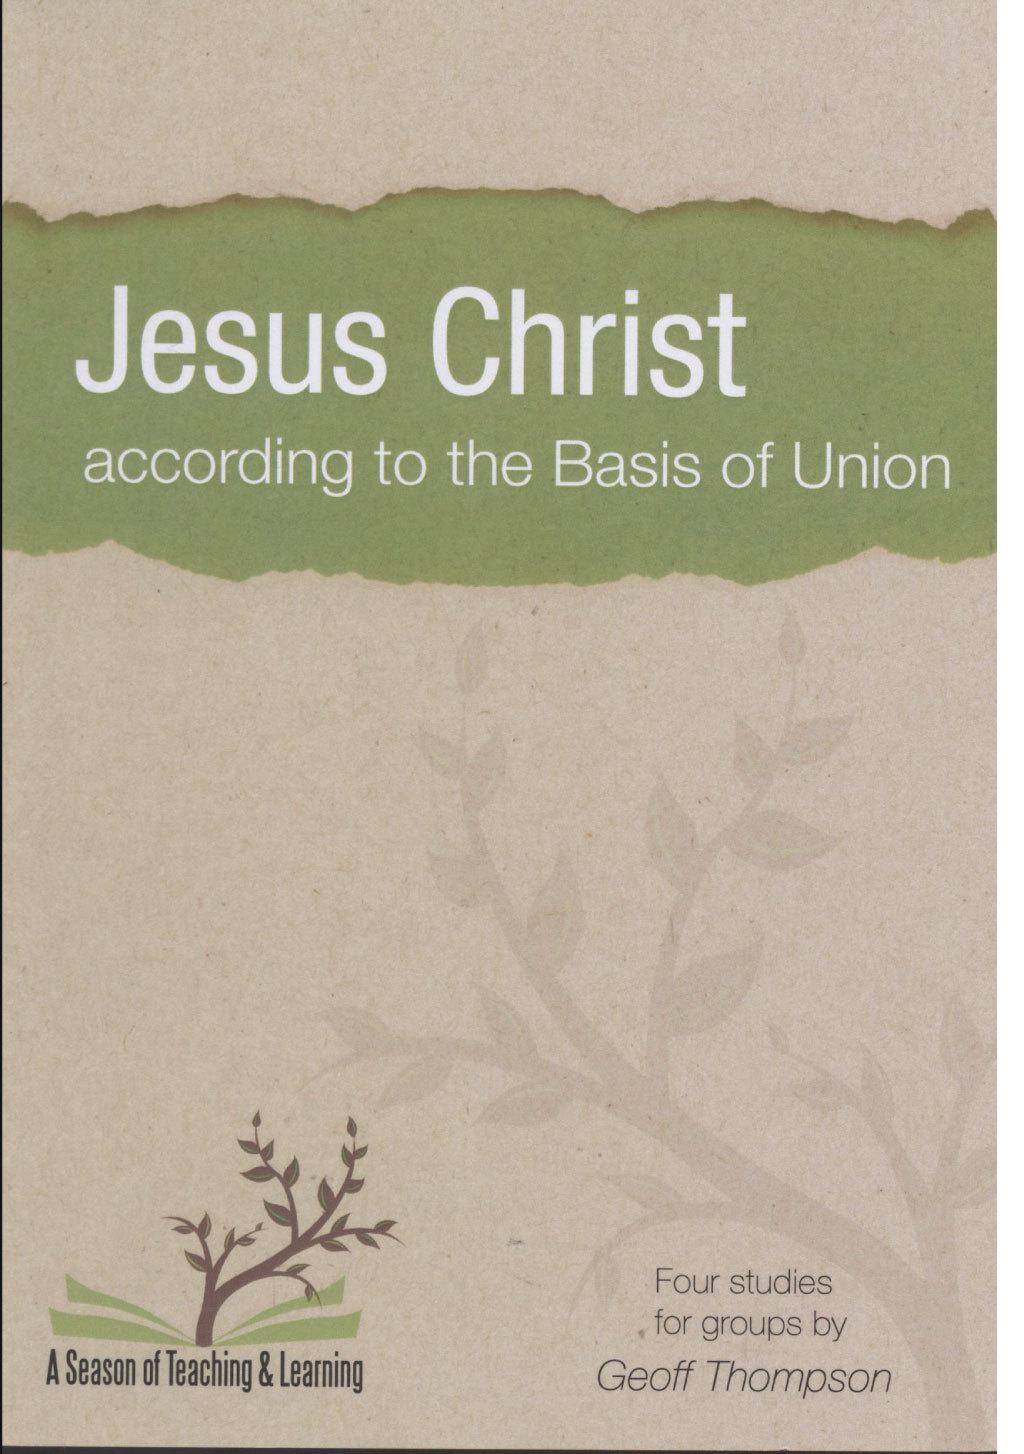 Jesus Christ According to the Basis of Union (2014)